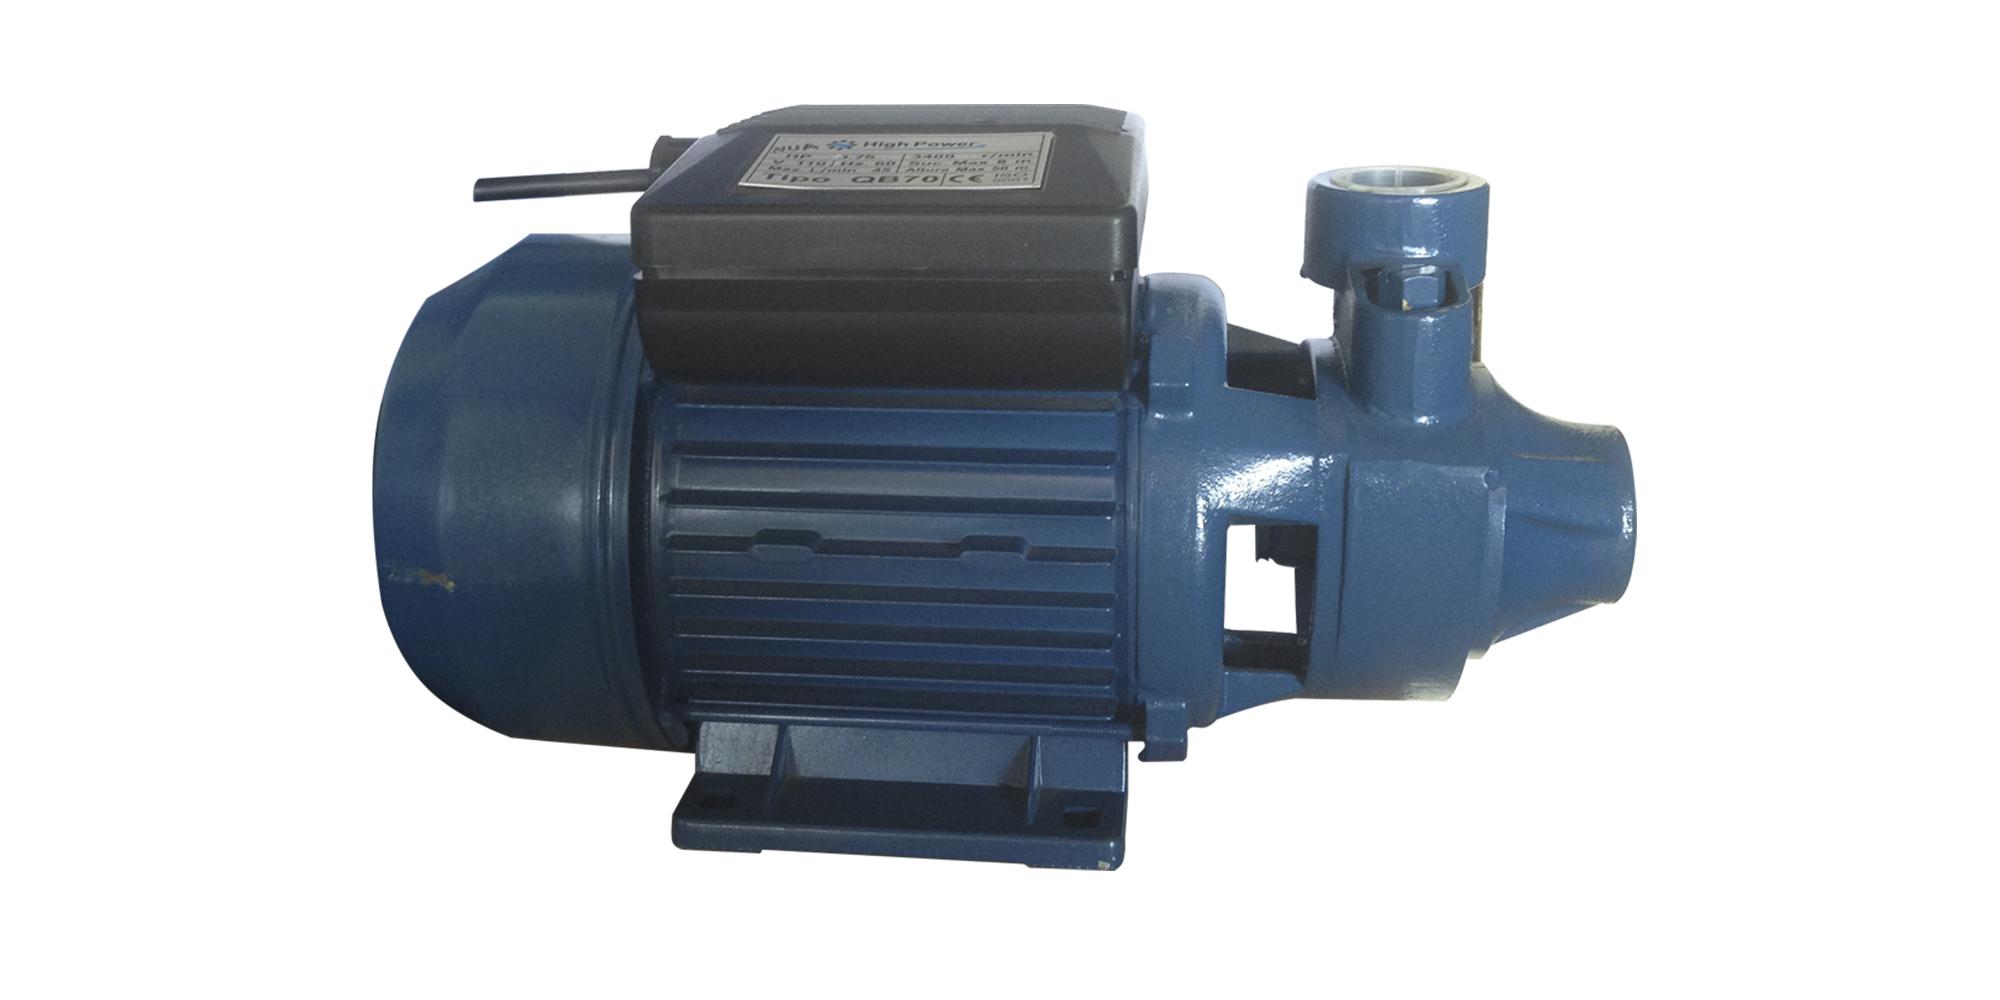 Bomba de agua perif rica high power pro de 3 4hp alkada - Bomba de agua precio ...